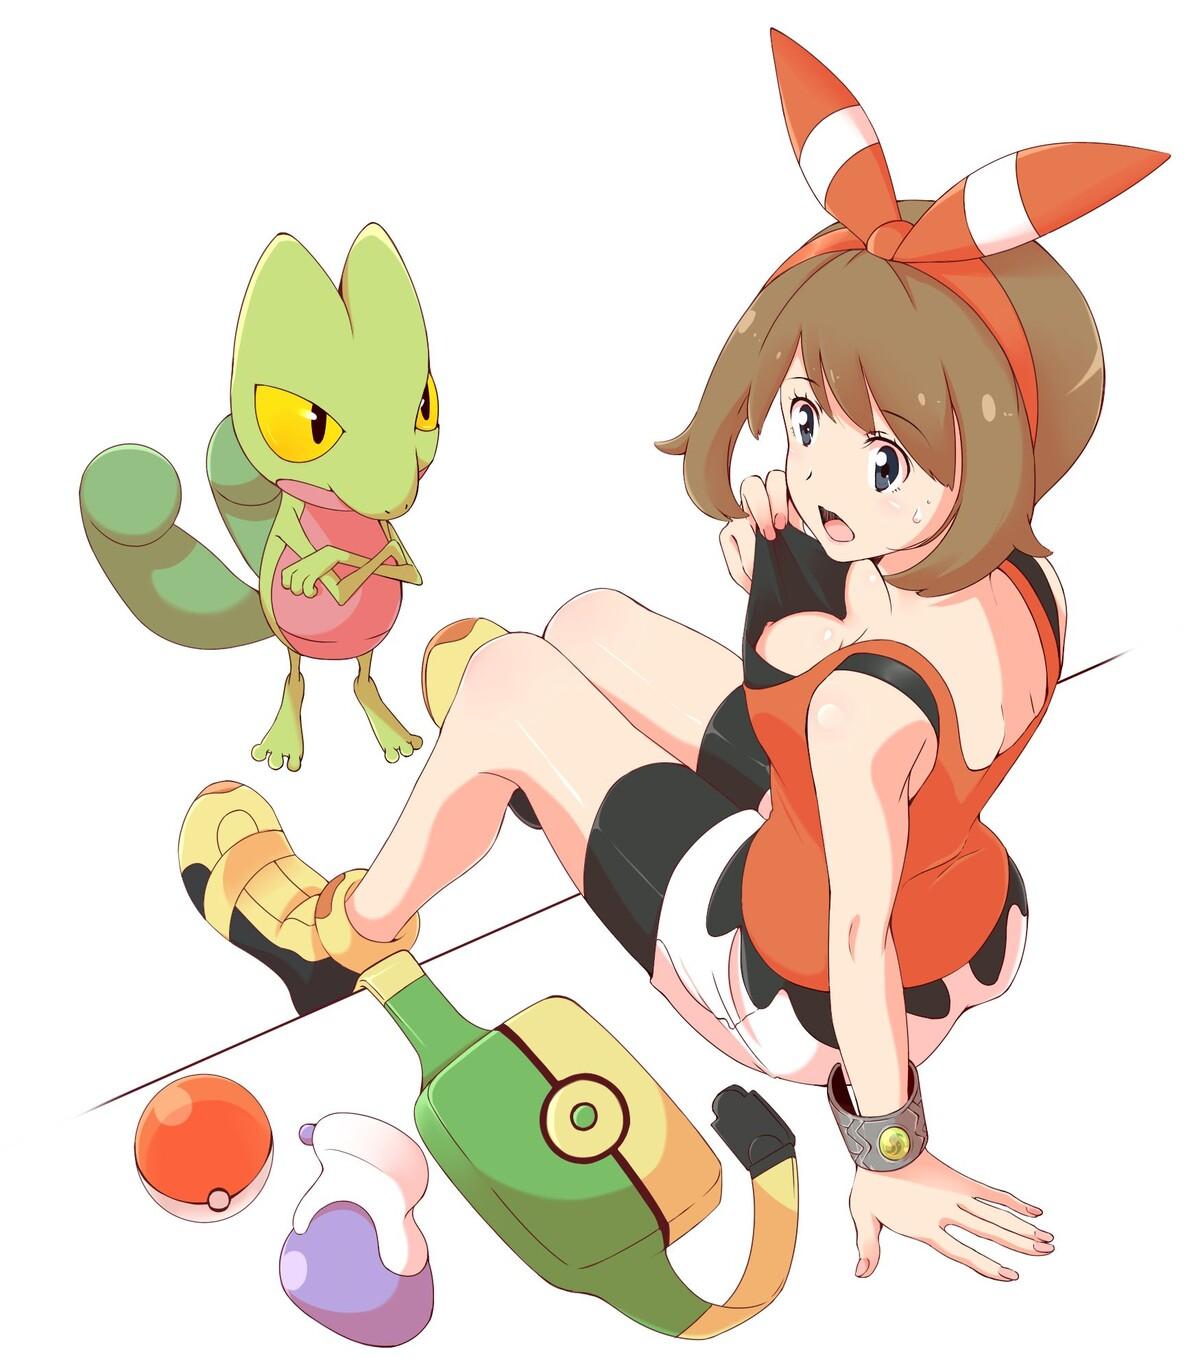 ORASmay_(pokemon)136